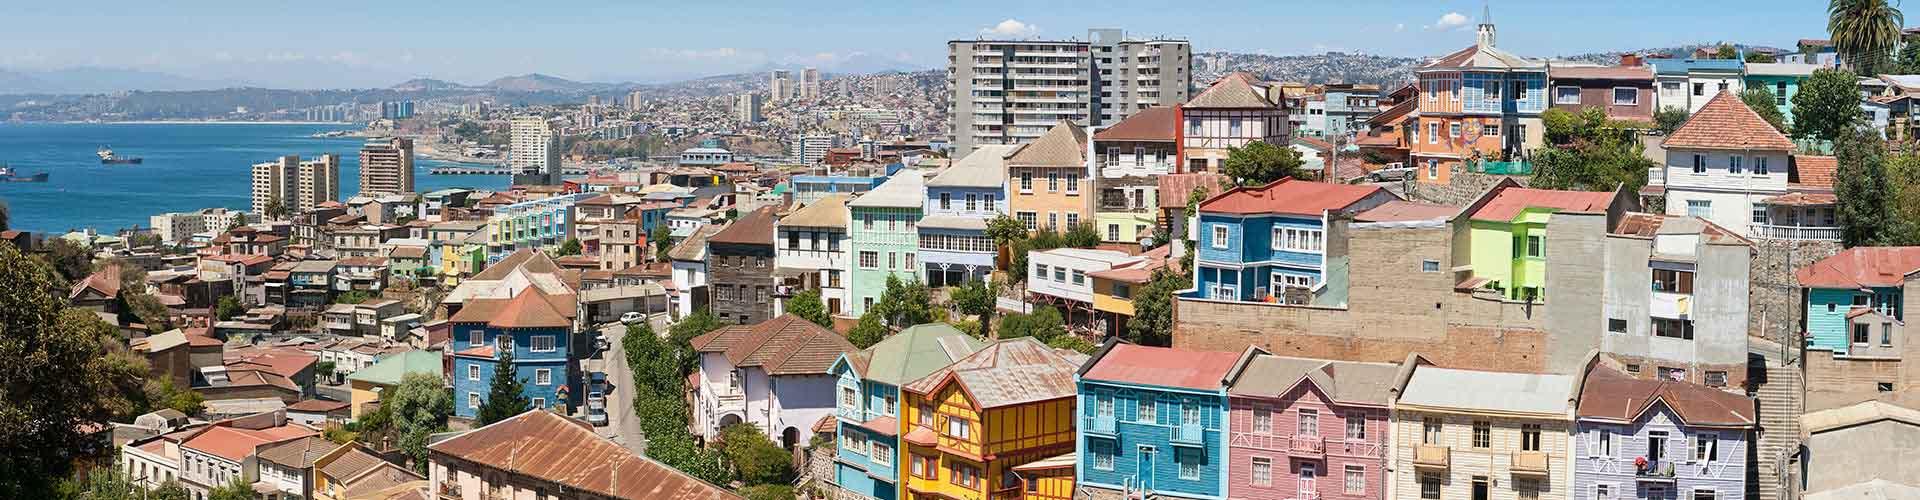 Valparaiso – Ostelli a Valparaiso. Mappe per Valparaiso, Foto e  Recensioni per ogni Ostello a Valparaiso.